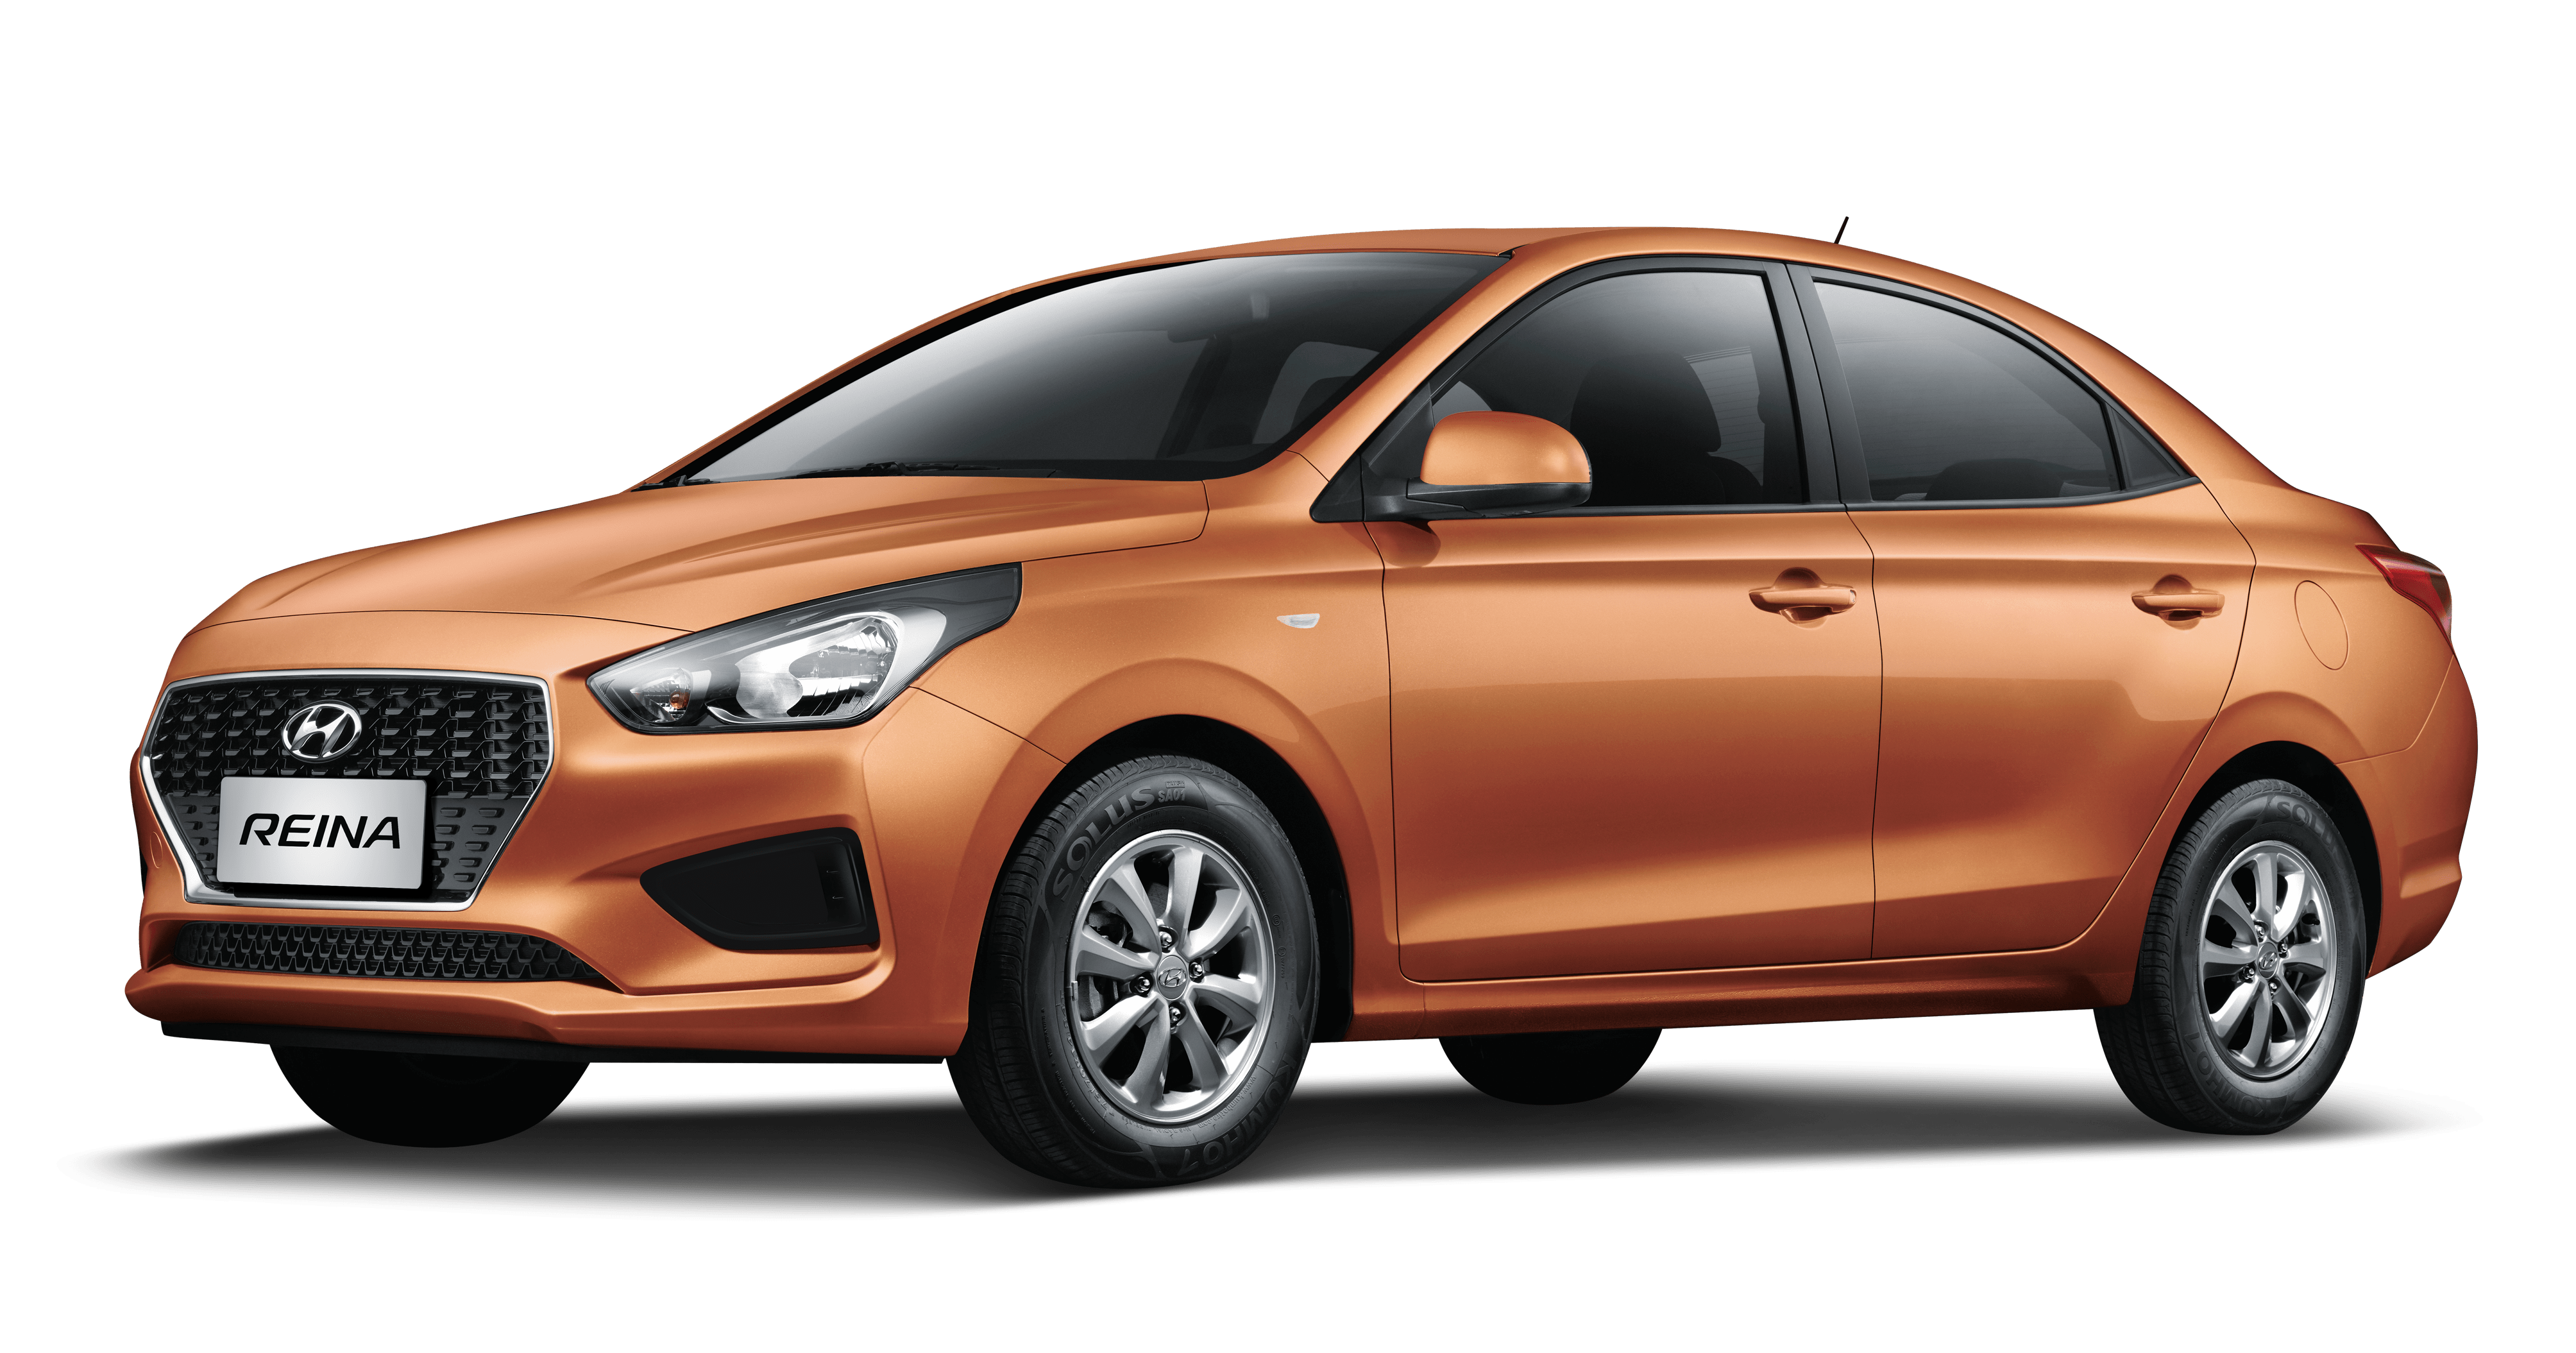 68 Great Hyundai Reina 2020 Reviews for Hyundai Reina 2020